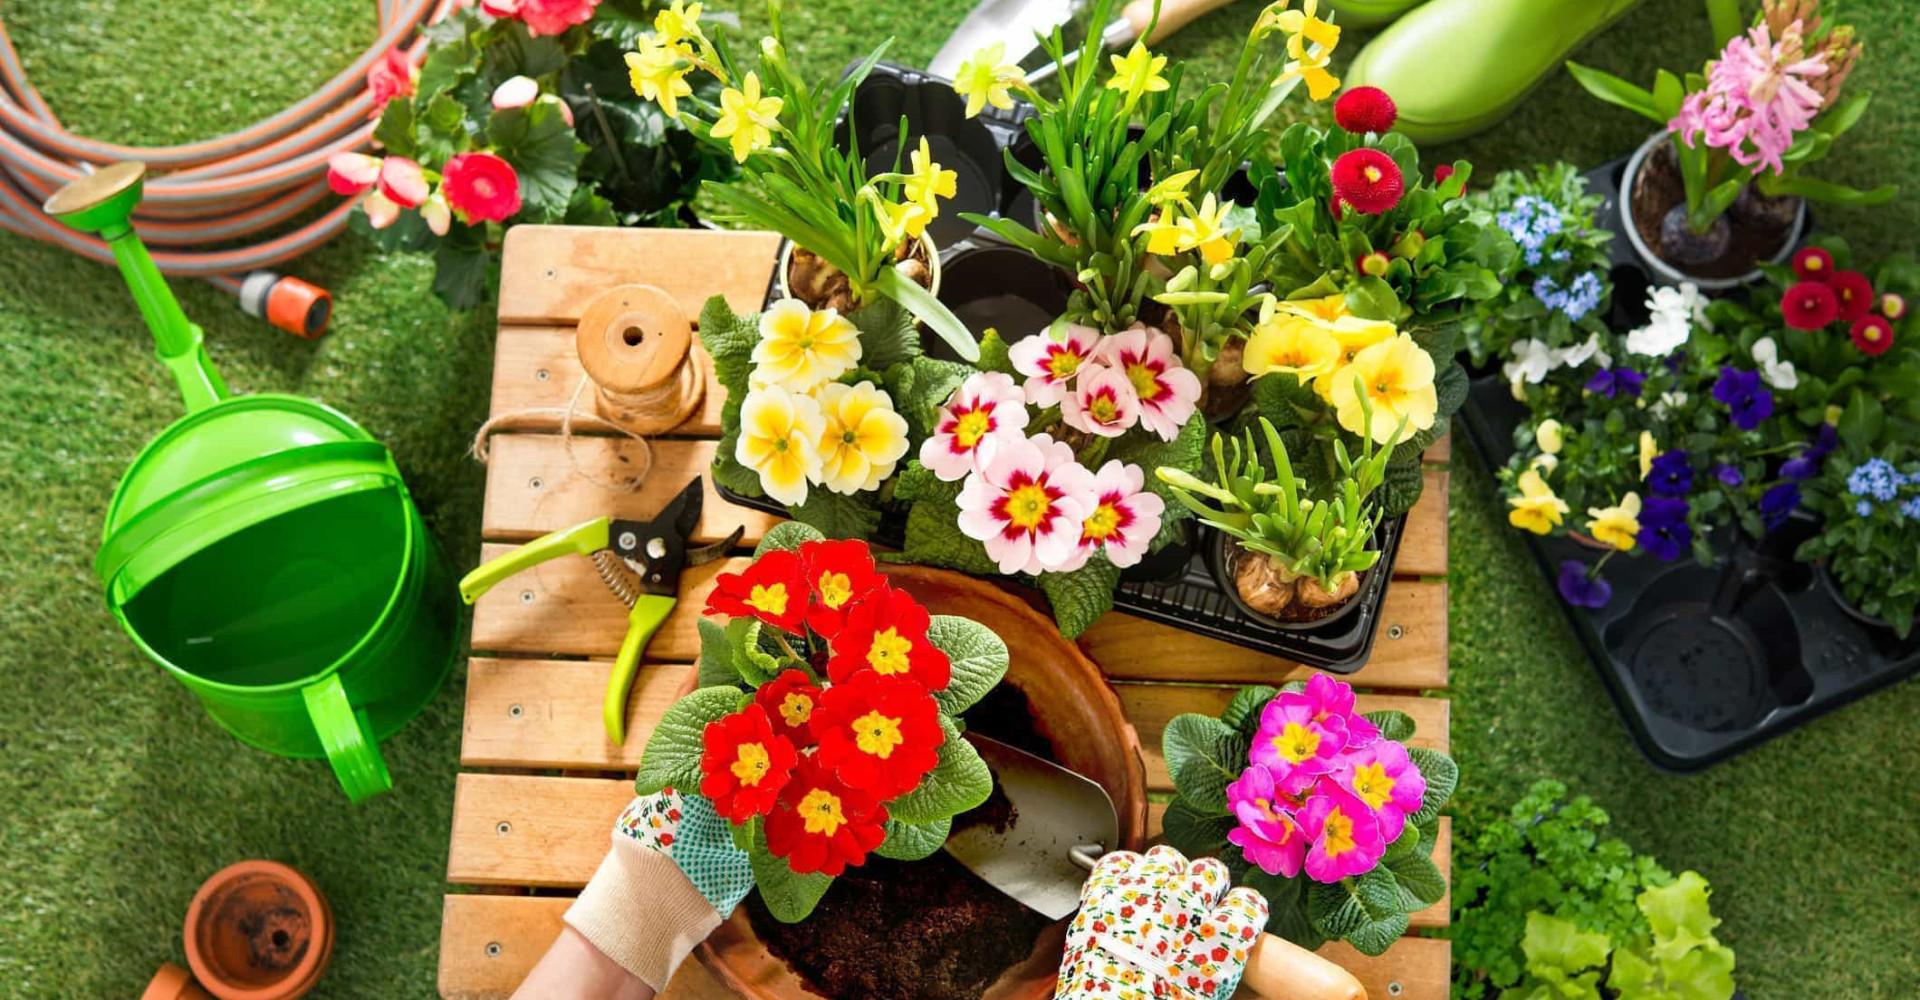 Tutte le alternative naturali ai pesticidi